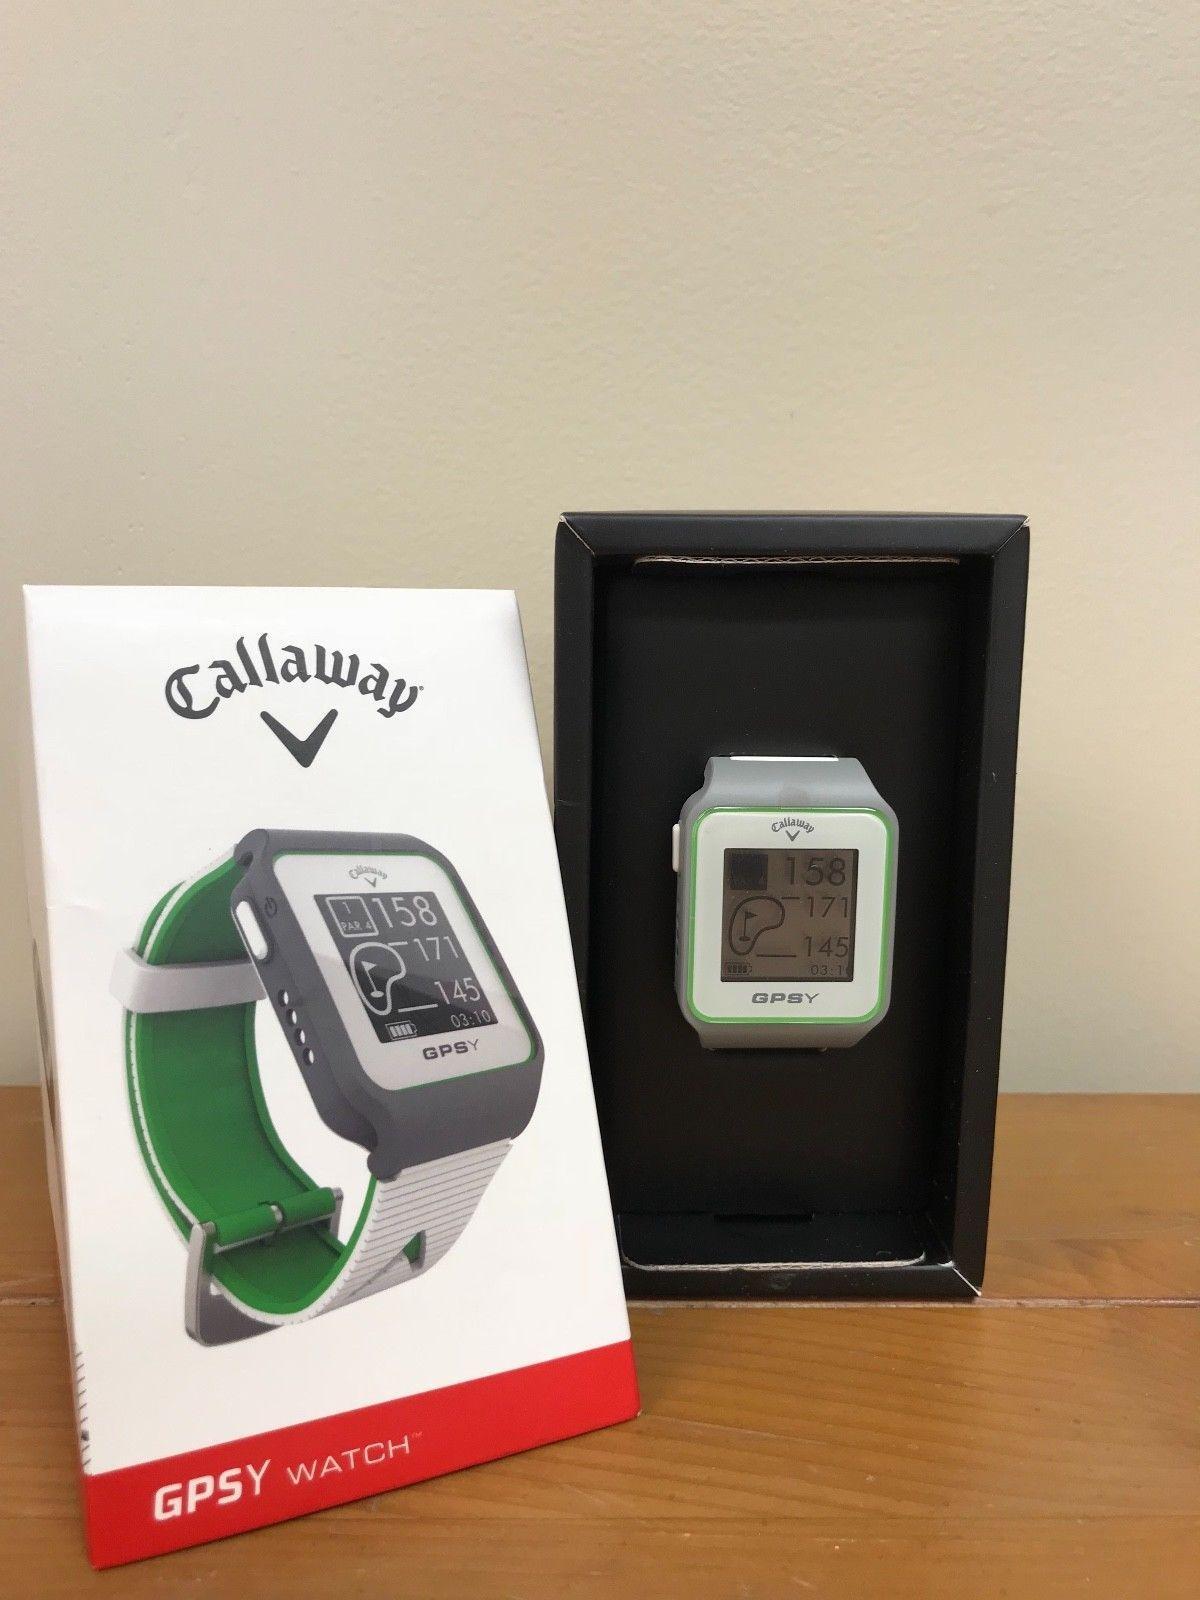 CALLAWAY GOLF GPSY SPORT WATCH WHITE/GREEN GPS/RANGE